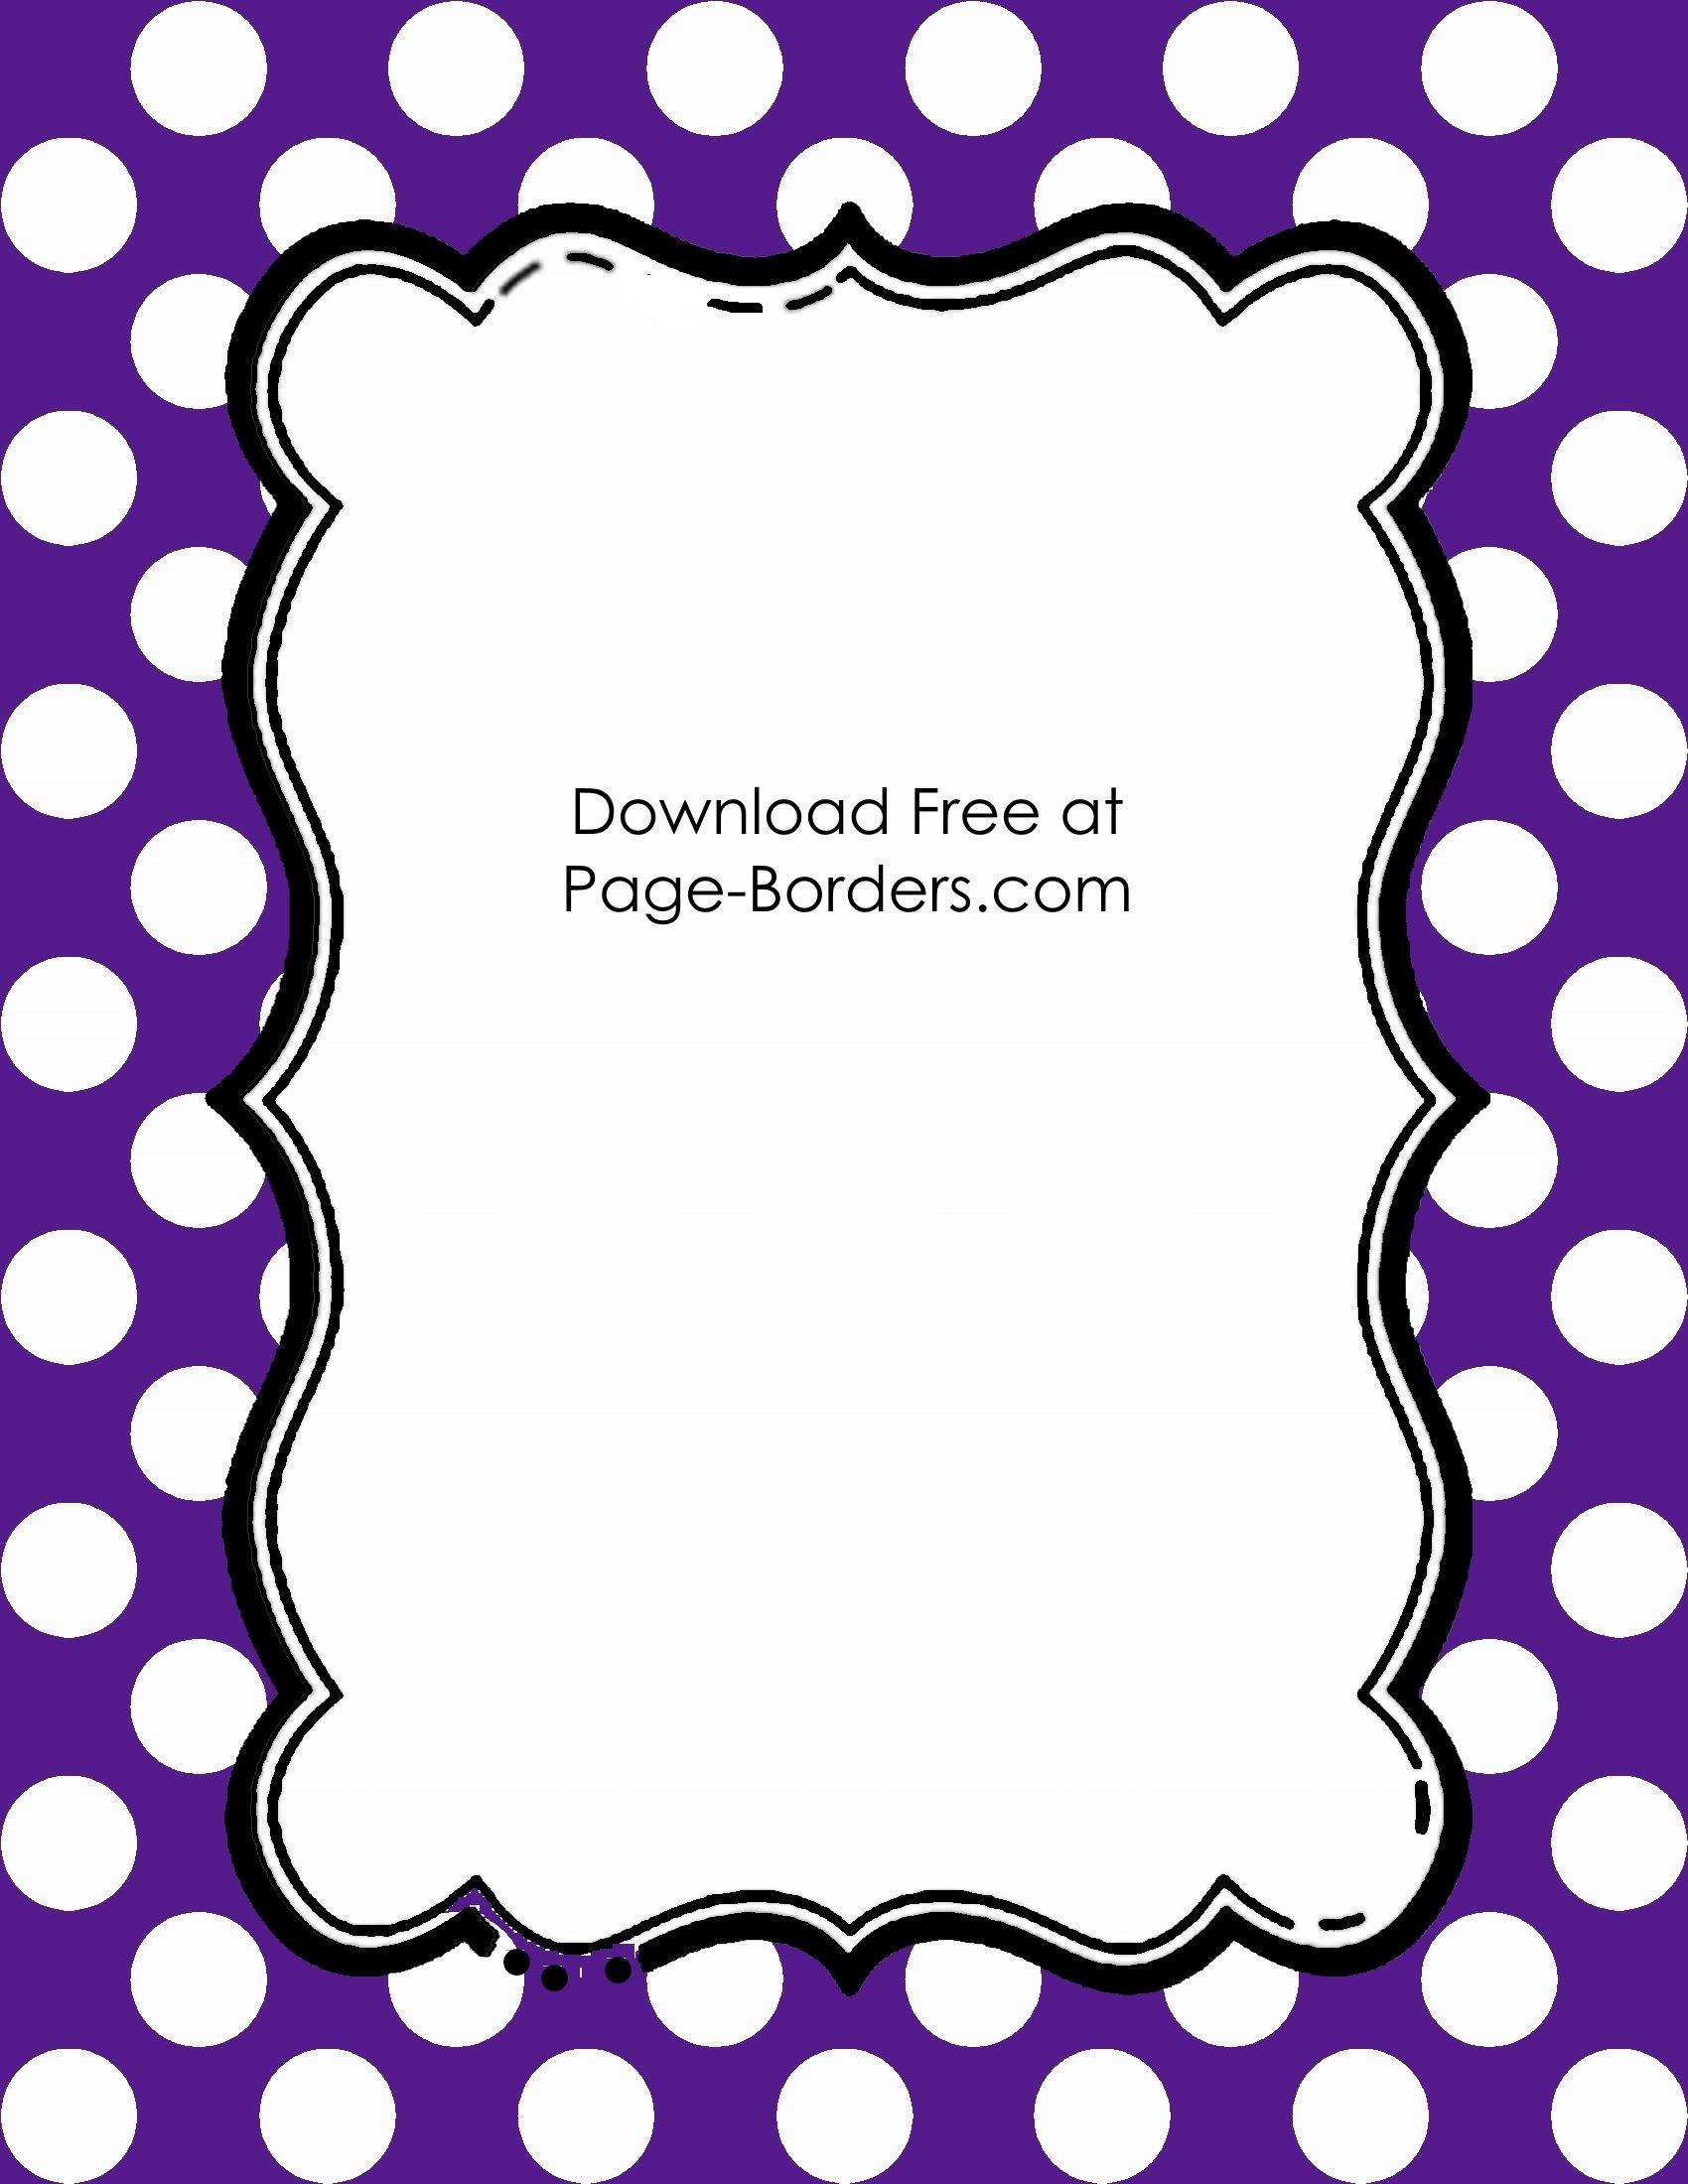 Free Polka Dot Border Templates in 16 Colors.